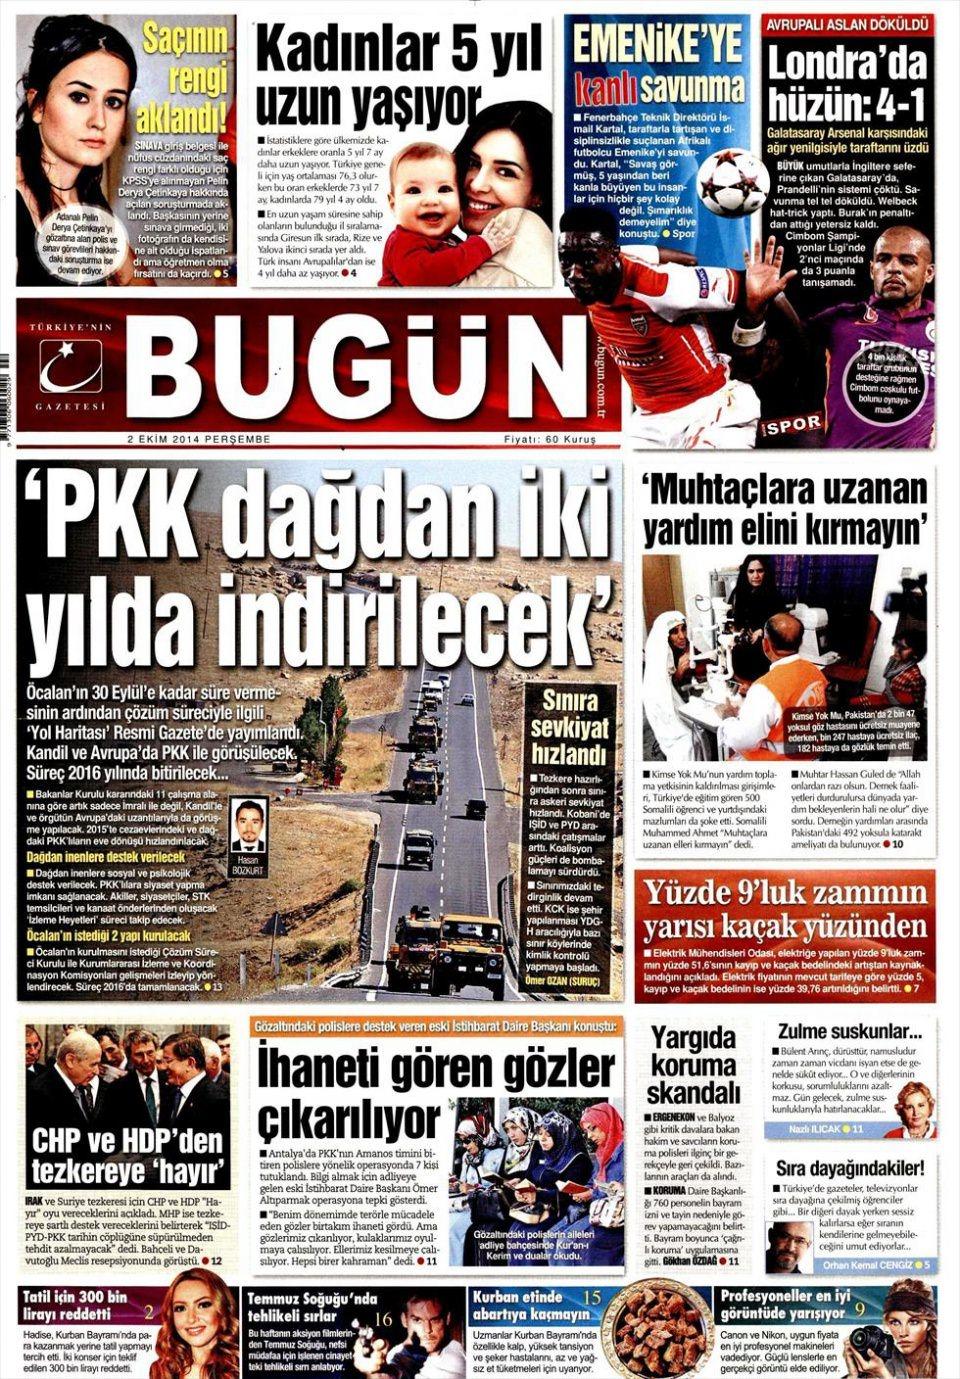 3 Ekim 2014 gazete manşetleri 3